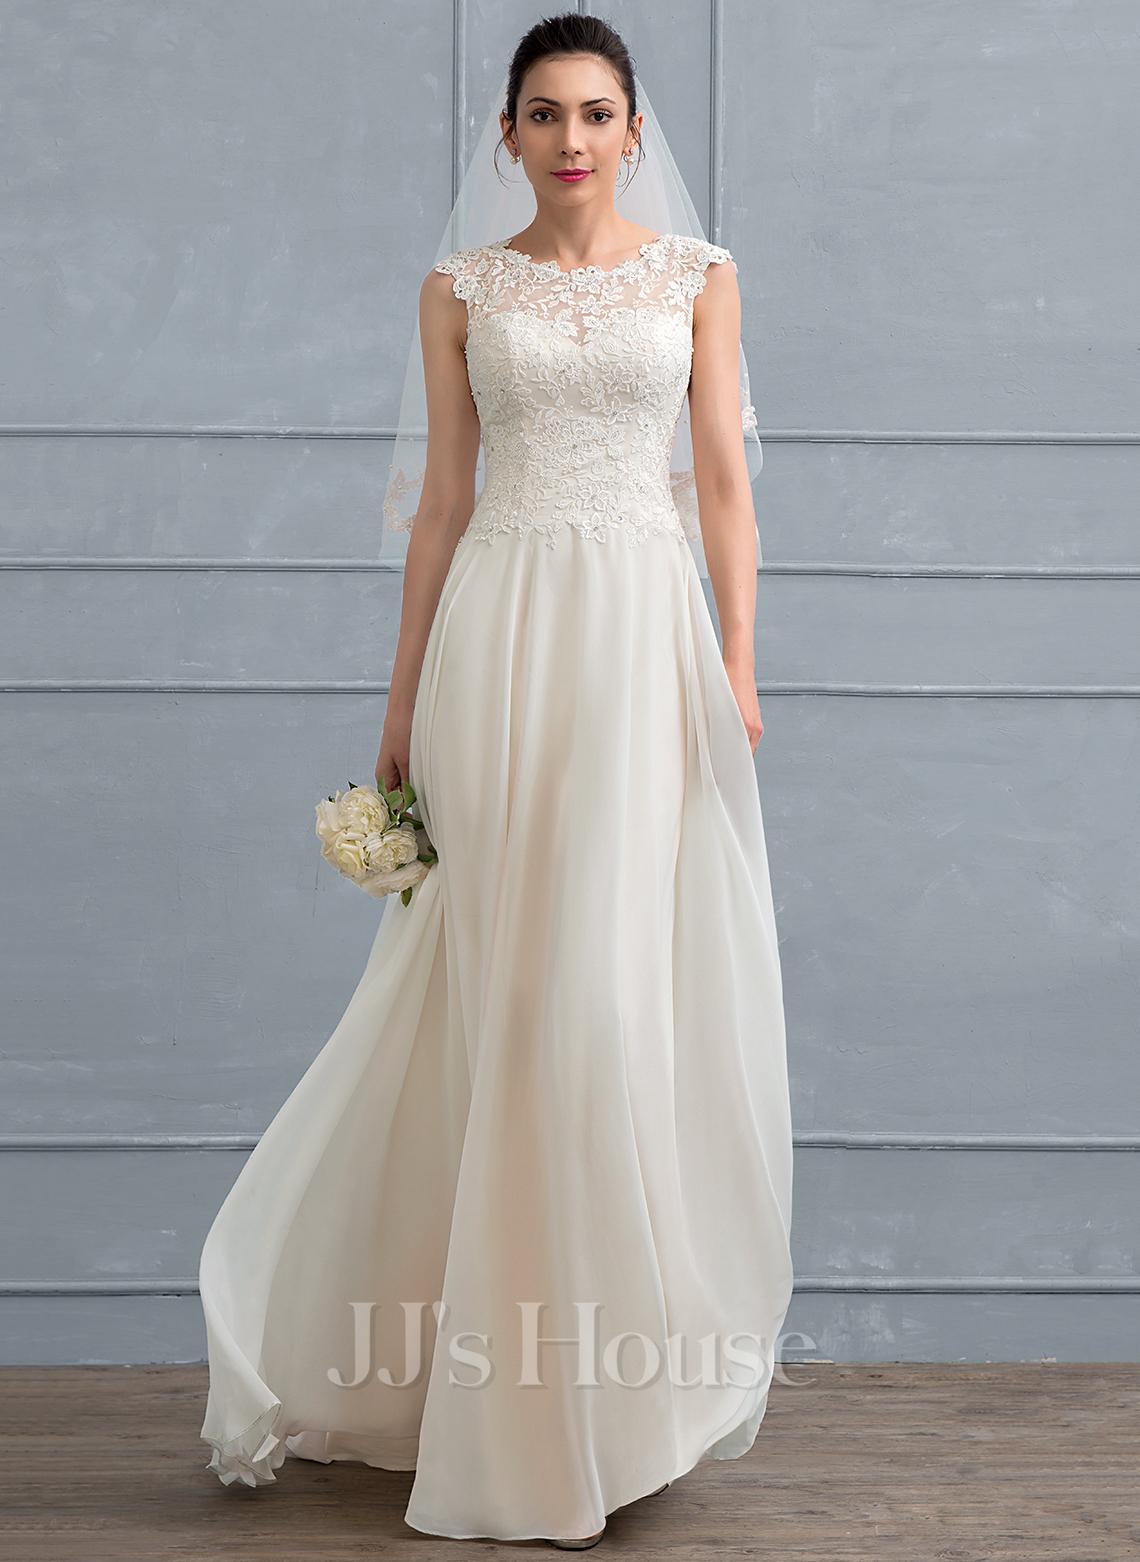 A-Line Floor-Length Chiffon Wedding Dress With Beading Sequins